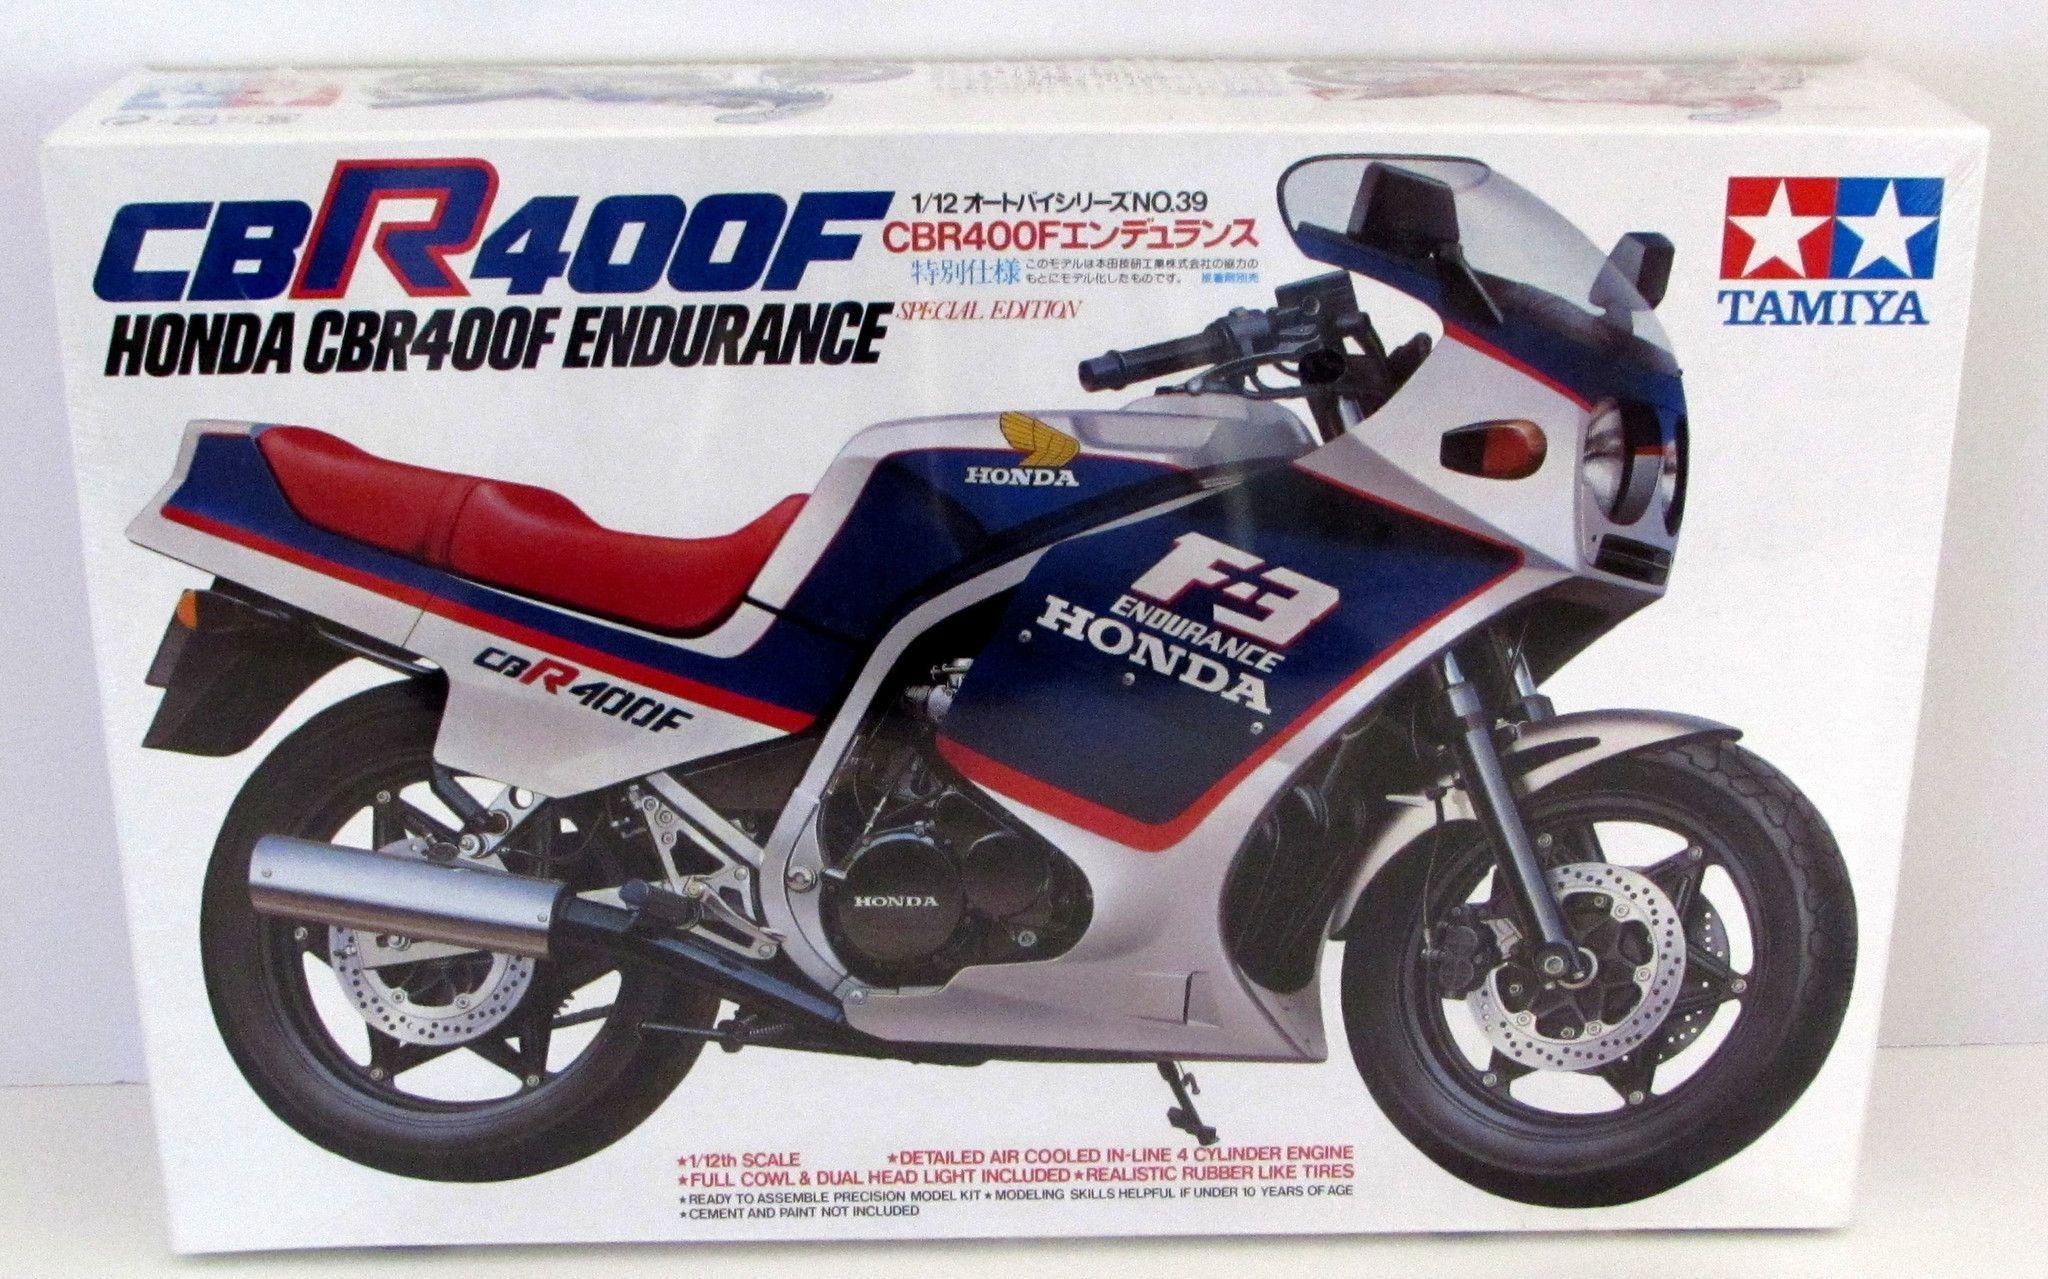 Honda CBR400F Endurance Tamiya 14039 1 12 Scale New Motorcycle Model Kit